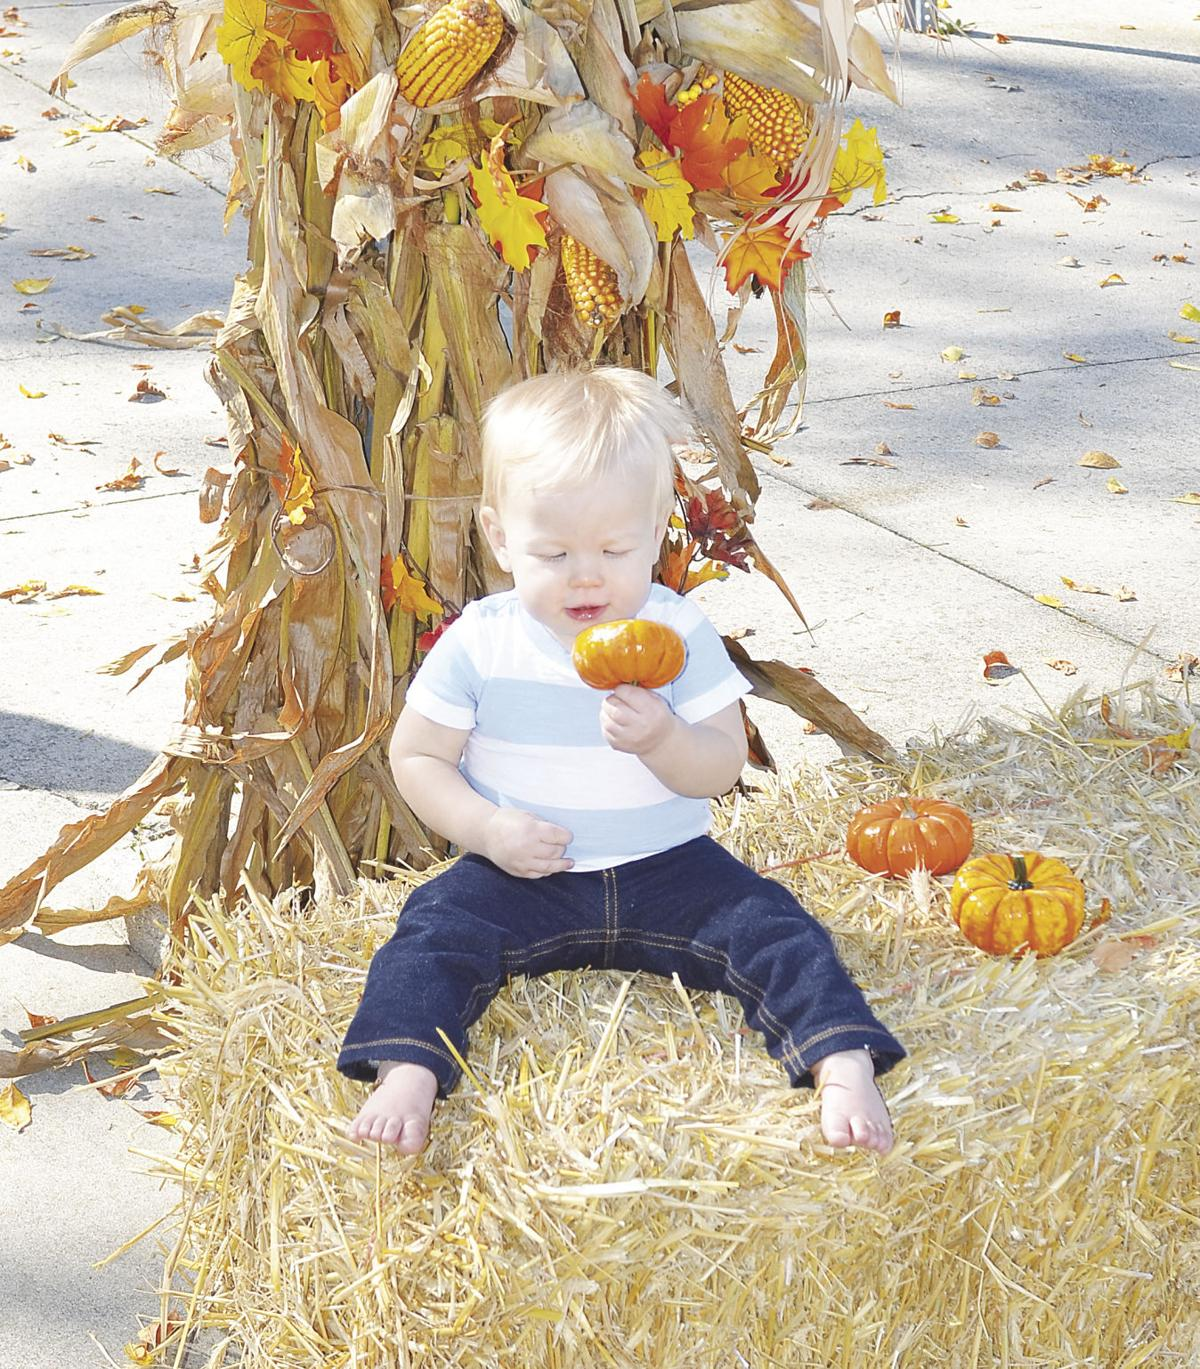 Pumpkin Picker?